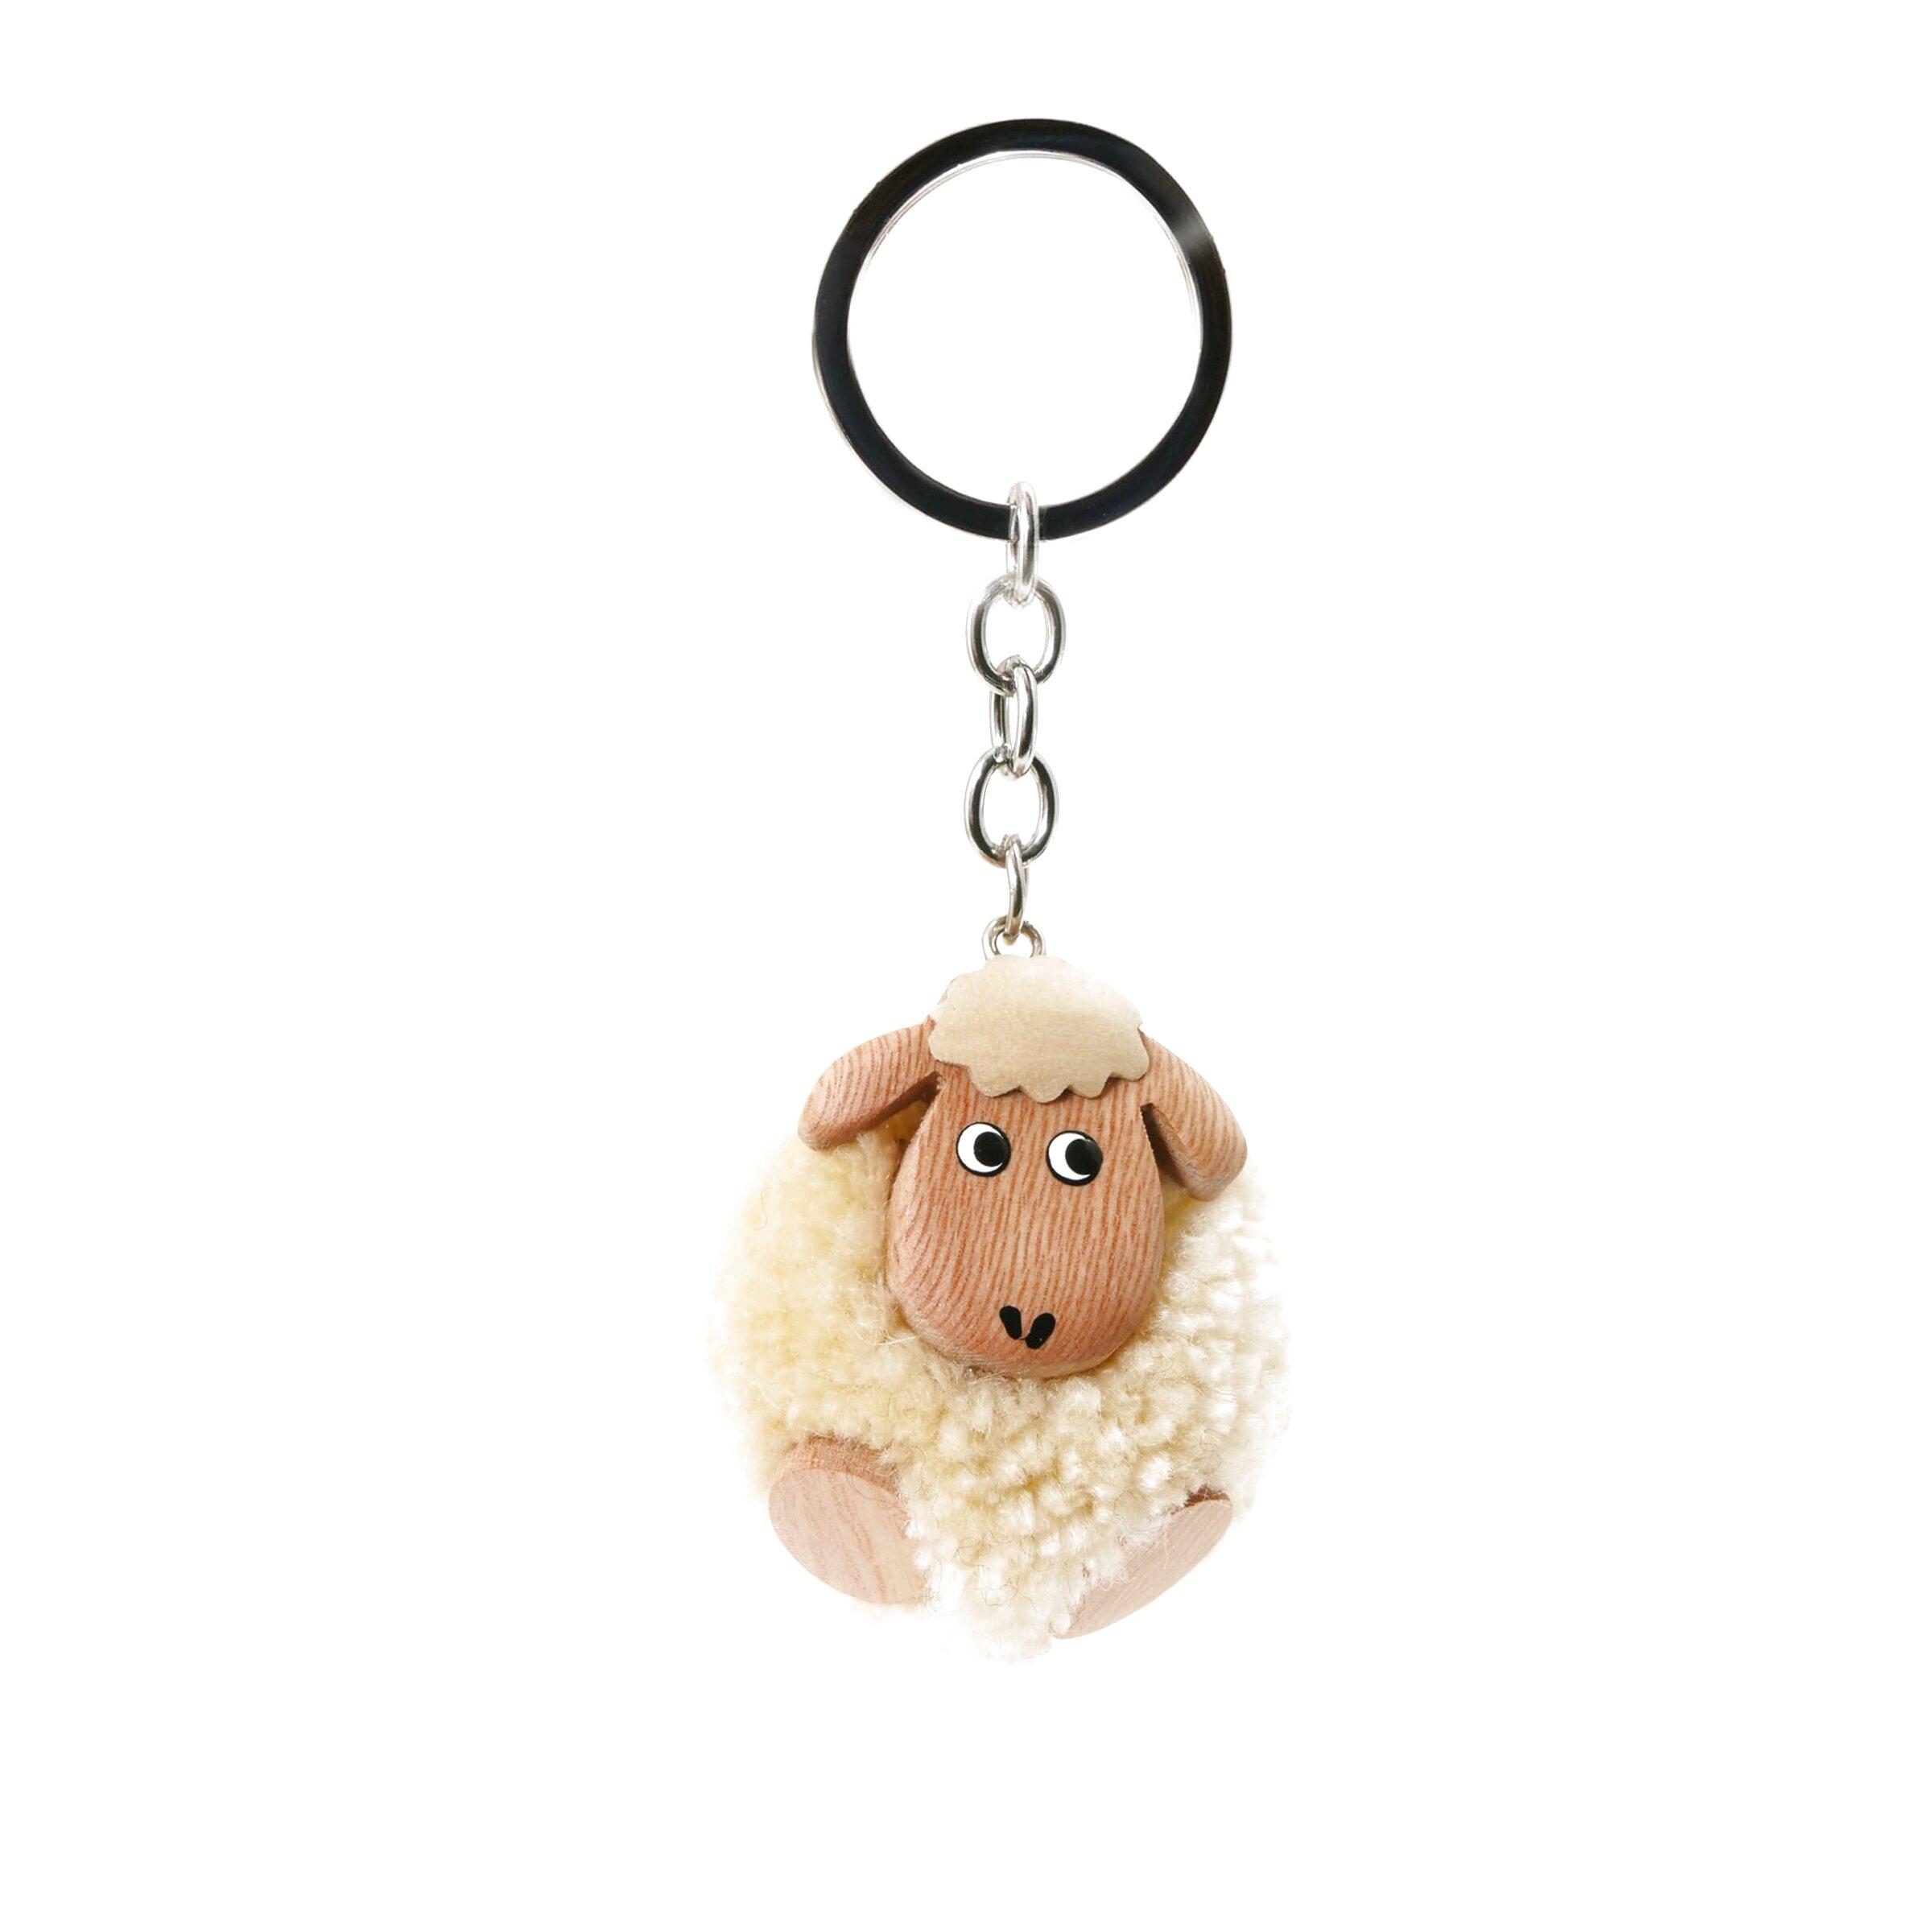 Welsh Sheep with Welsh Flag Acrylic Bag Purse Keyring Charm